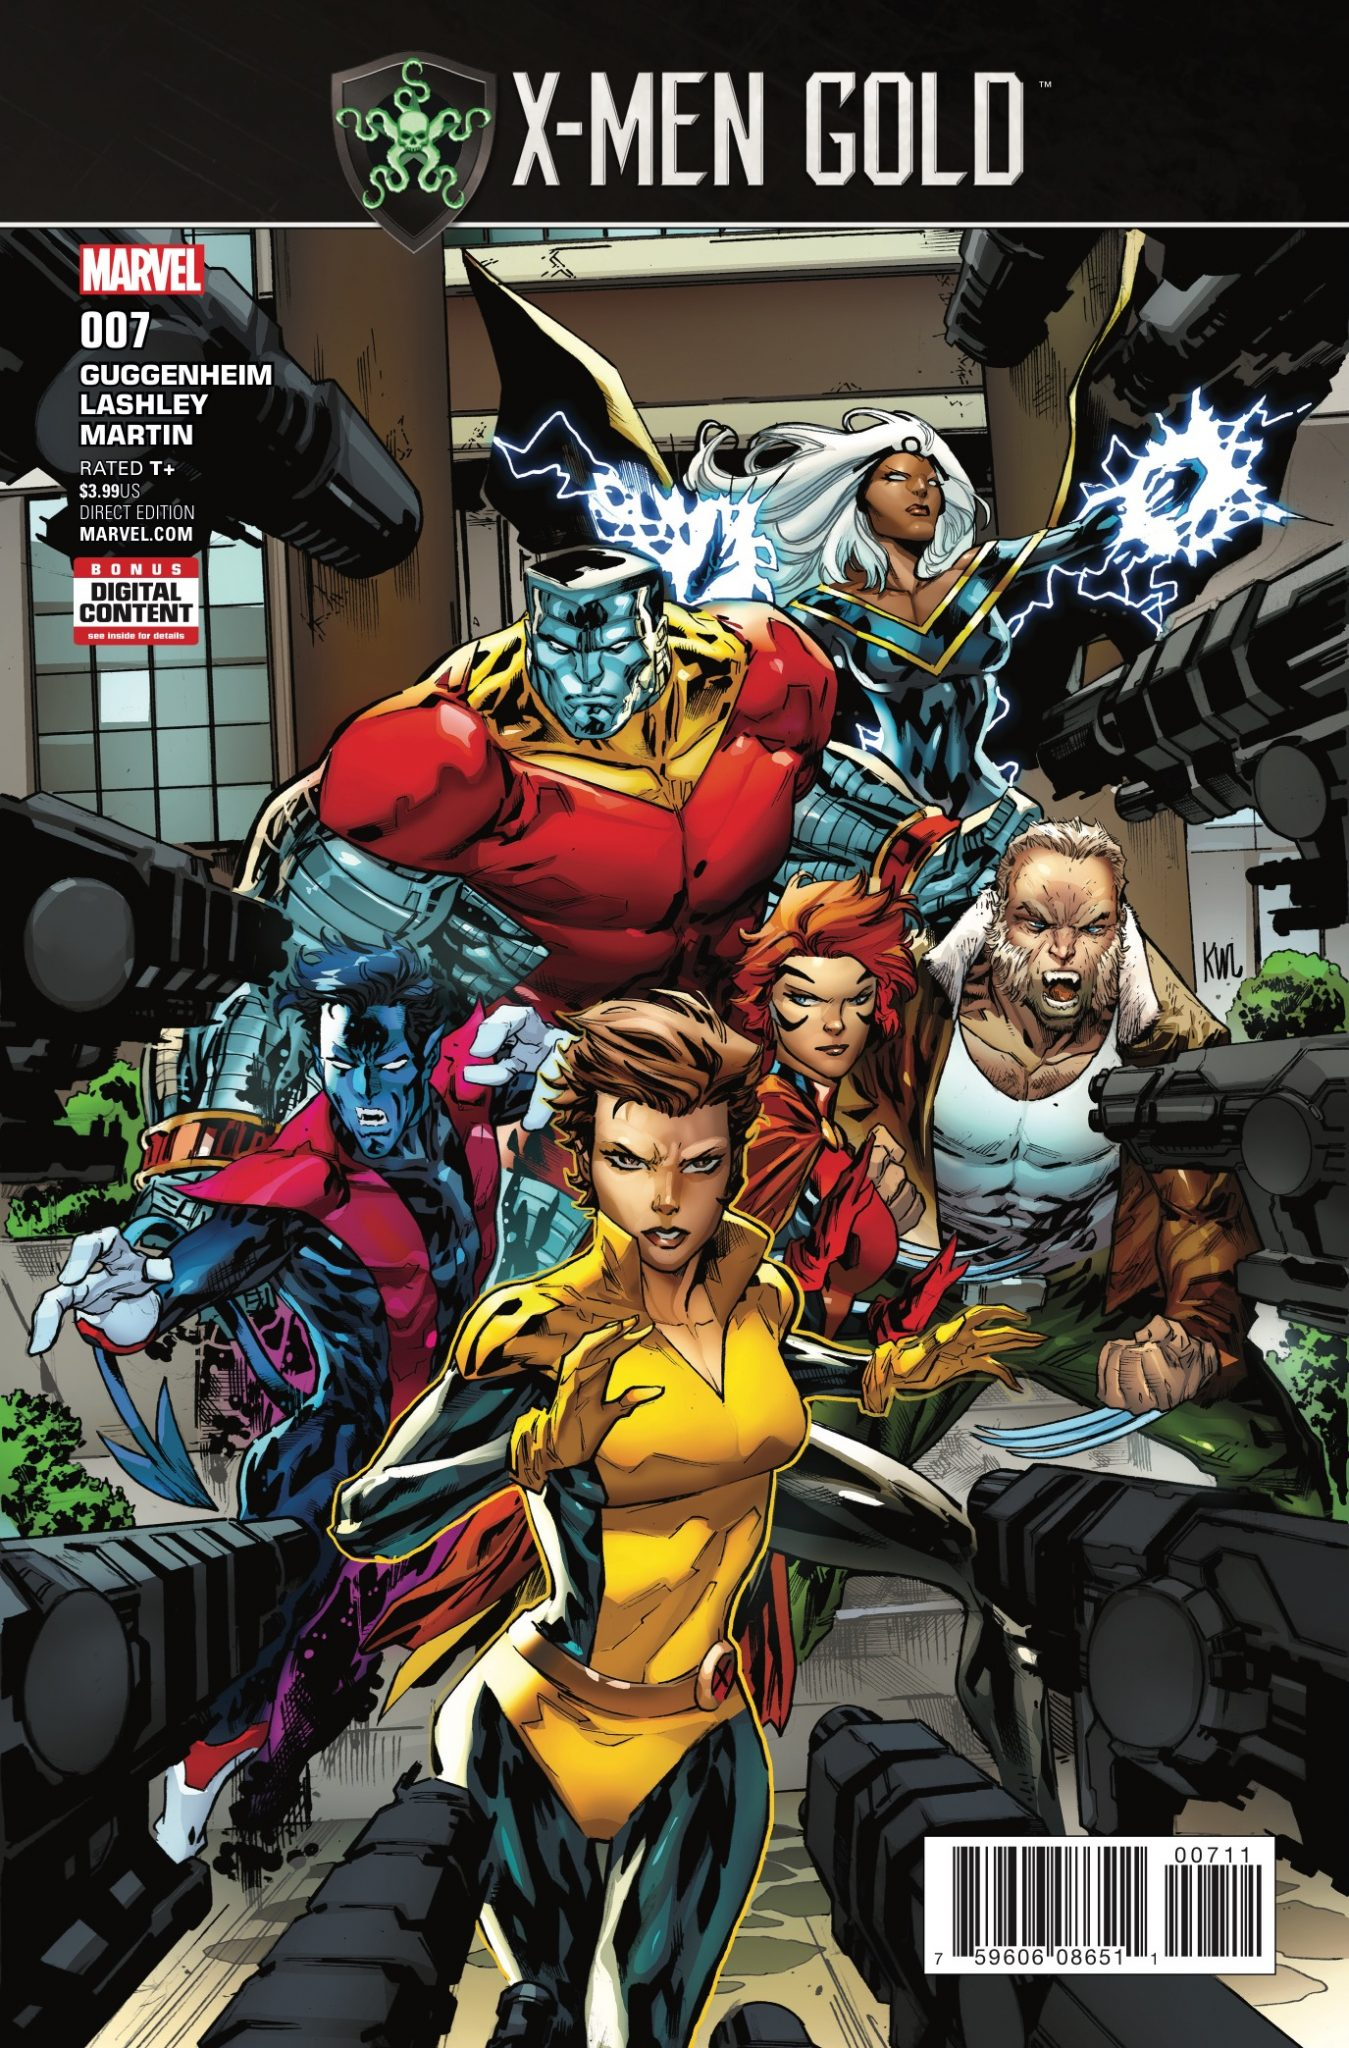 X-Men: Gold #7 Review